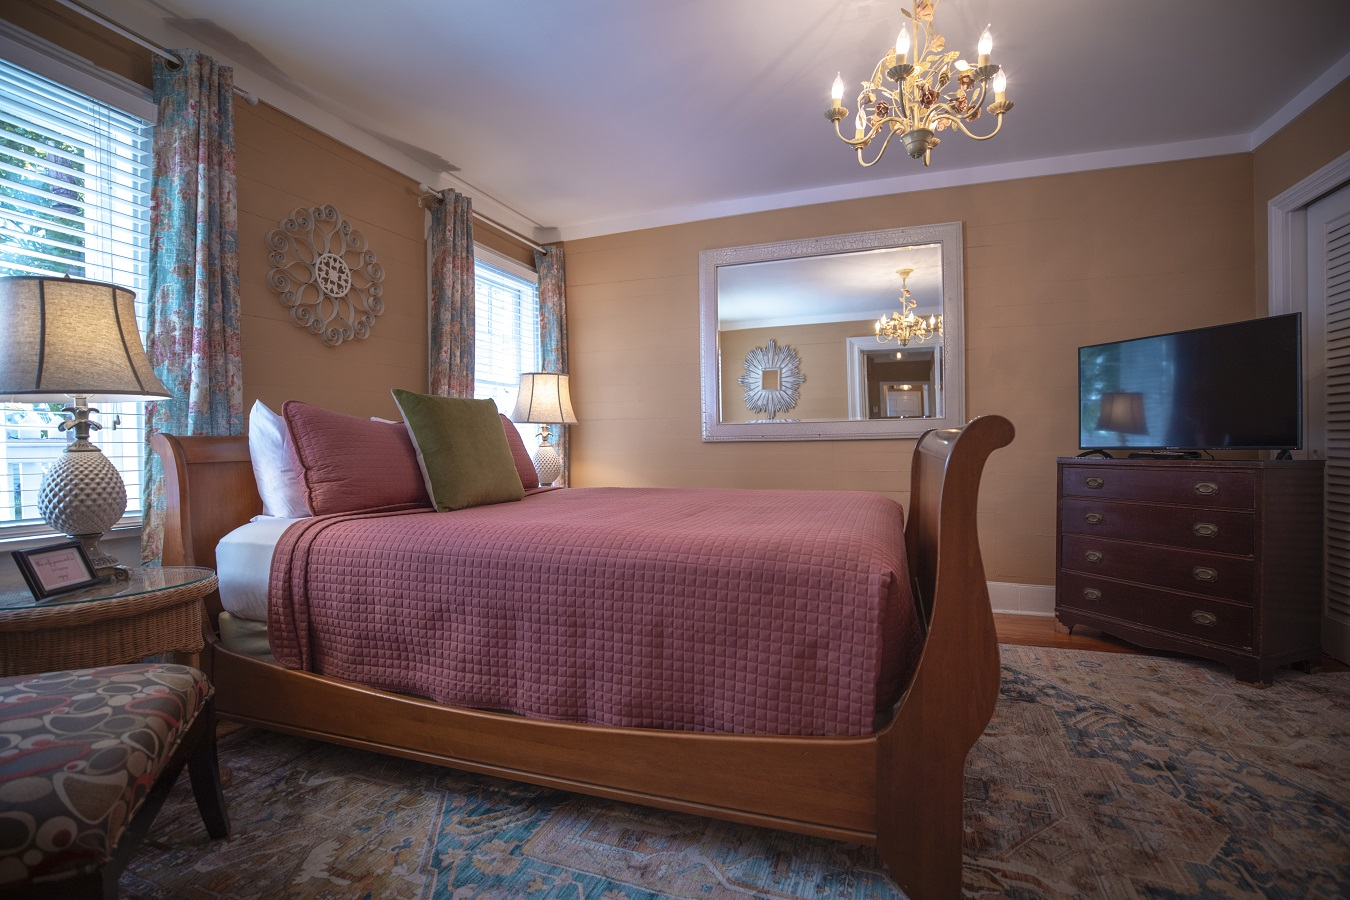 Key West Vacation Home - William Skelton House - Boca Queen Bedroom